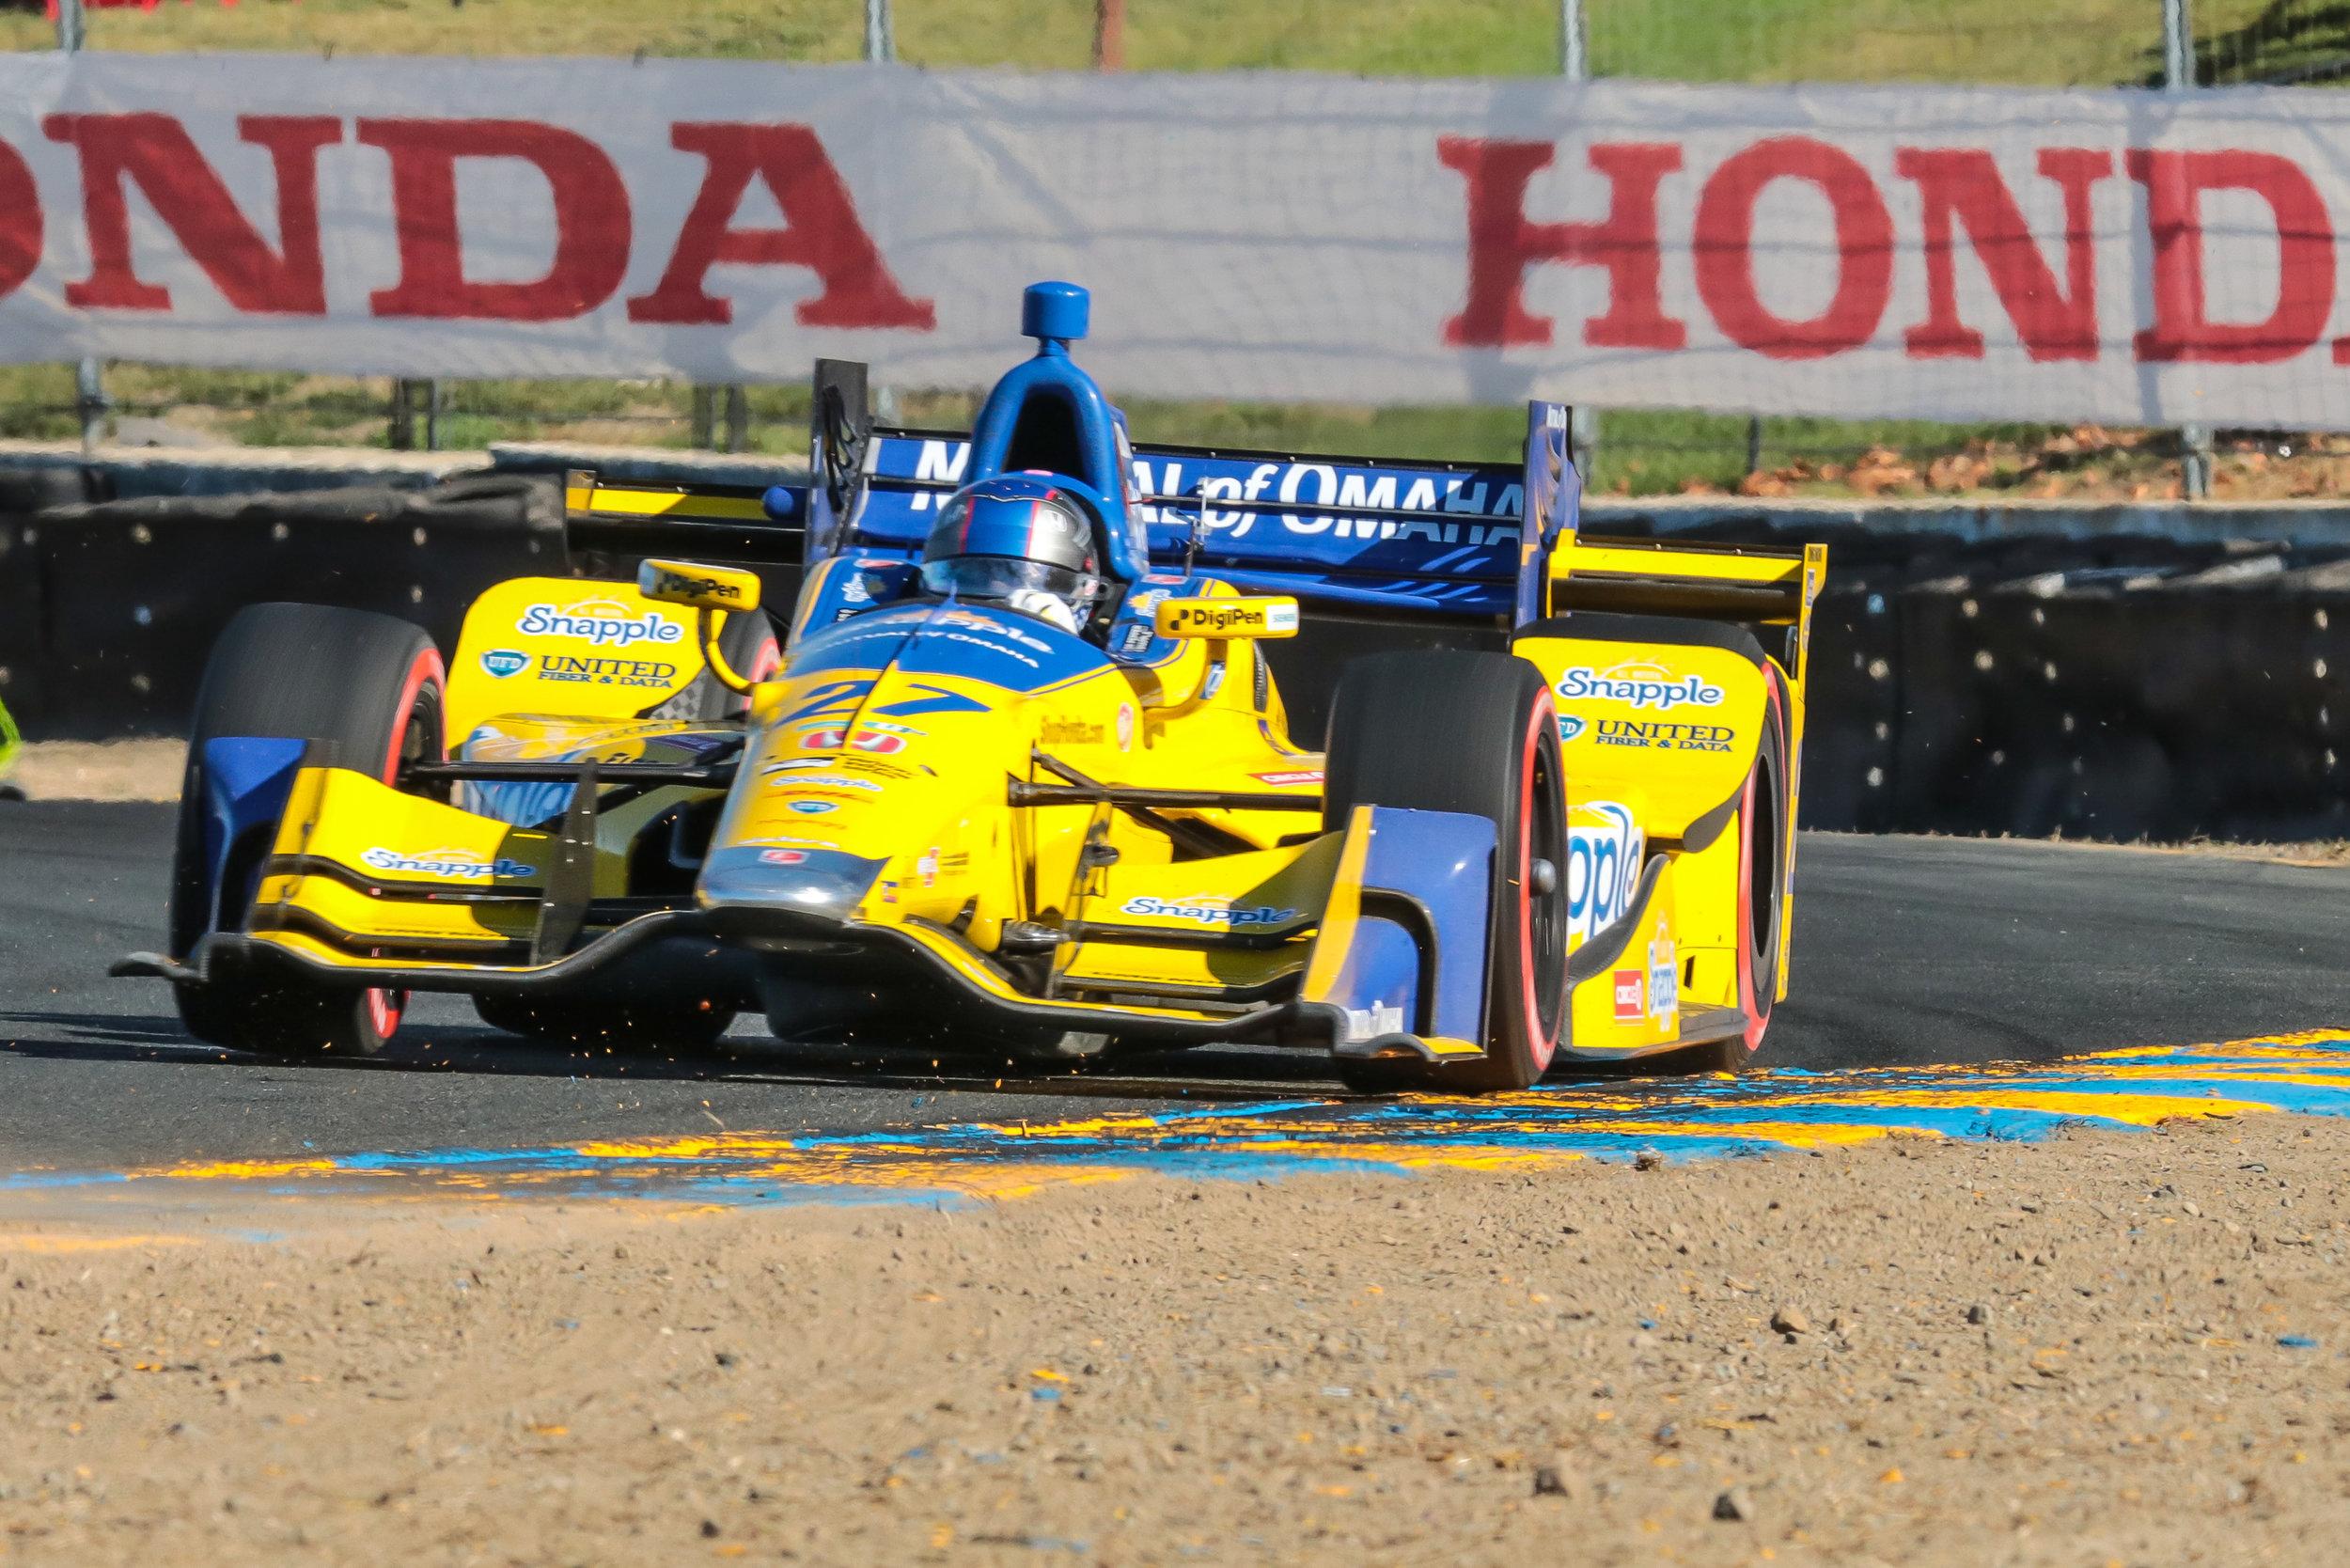 Indy16-2951.jpg